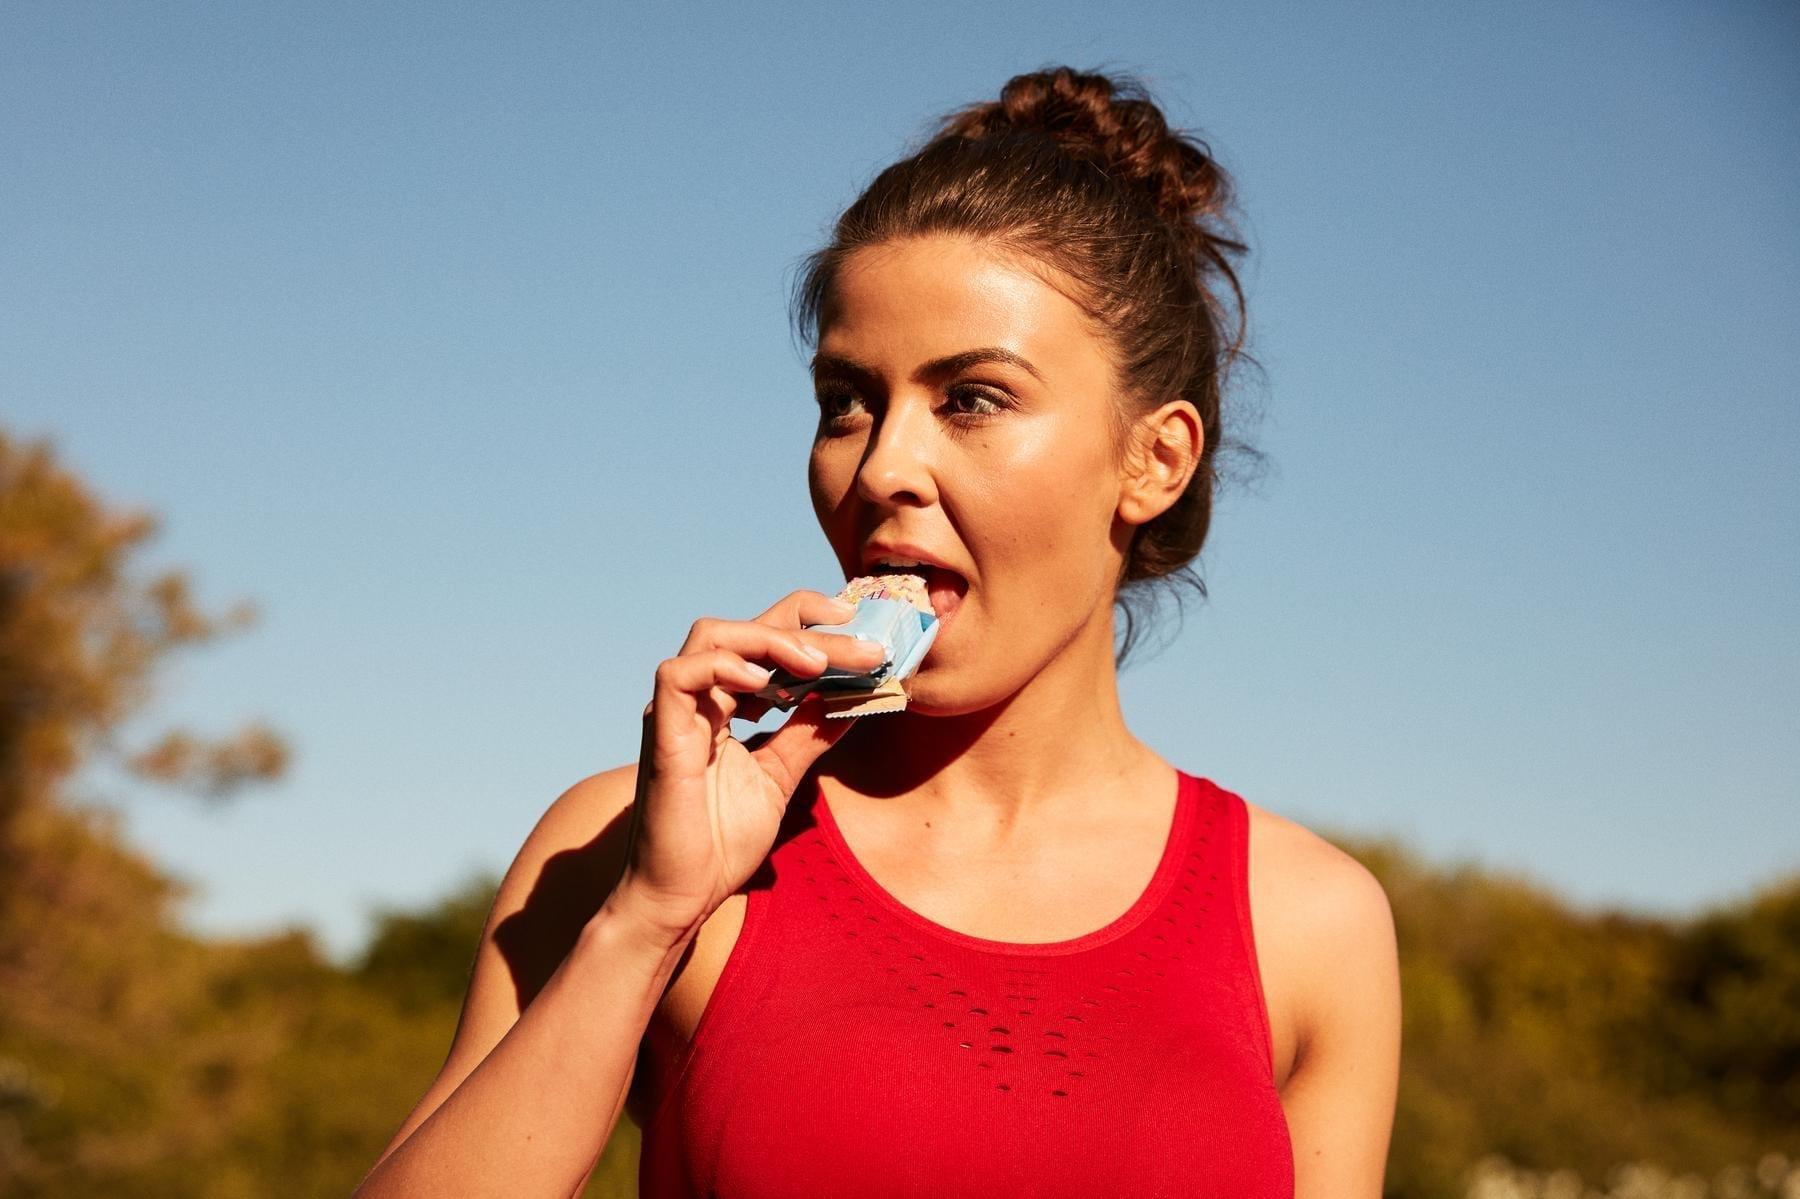 Wie viele Kilokalorien solltest du essen, um abzunehmen?